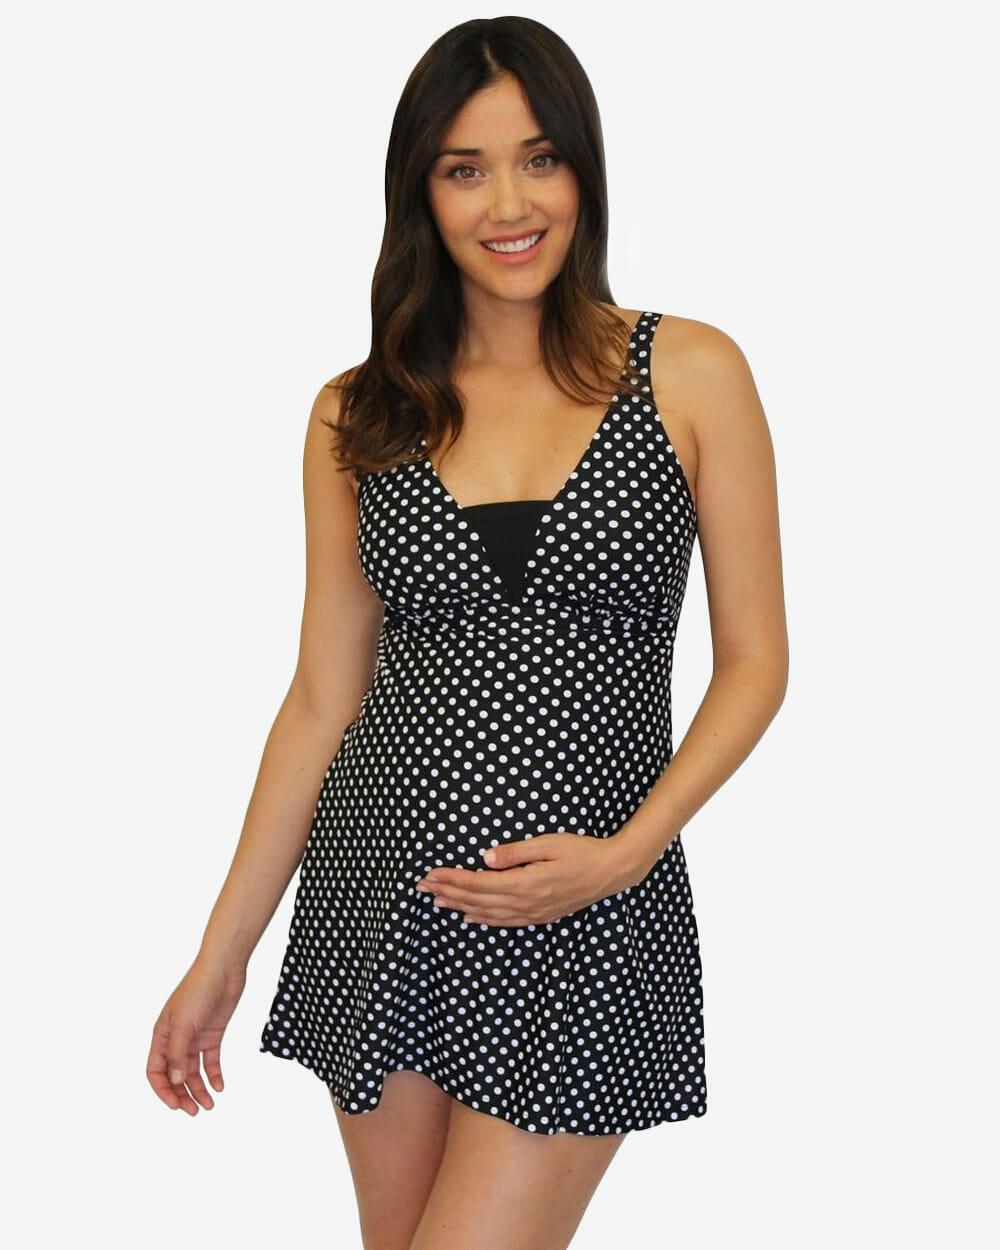 Maternity Dresskini Maternity Swim Top